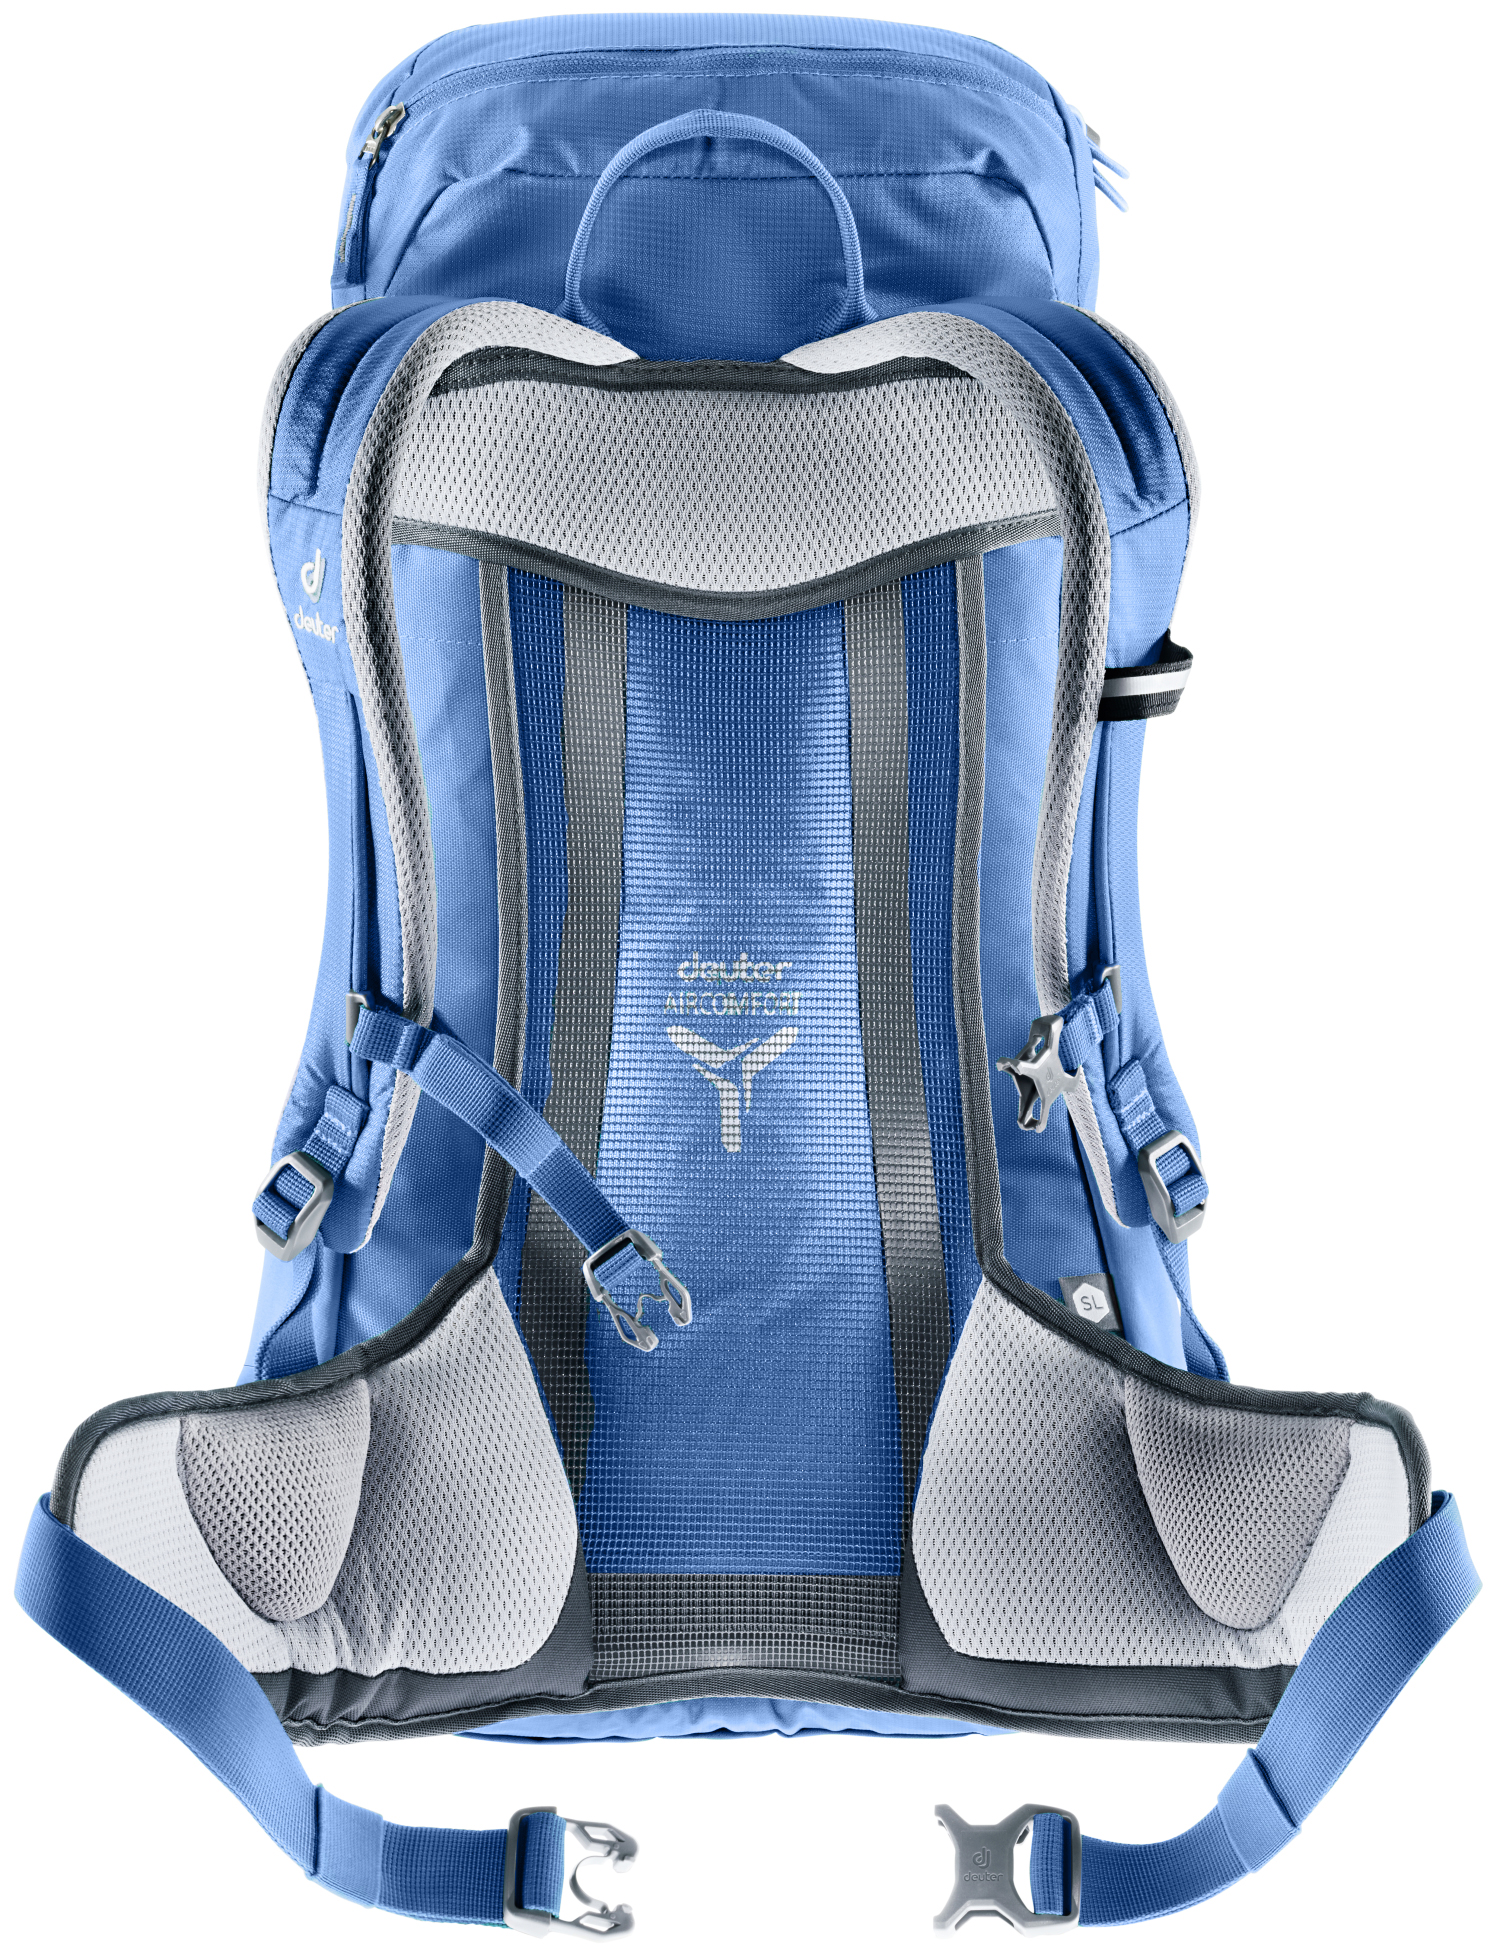 Aircomfort backsystem